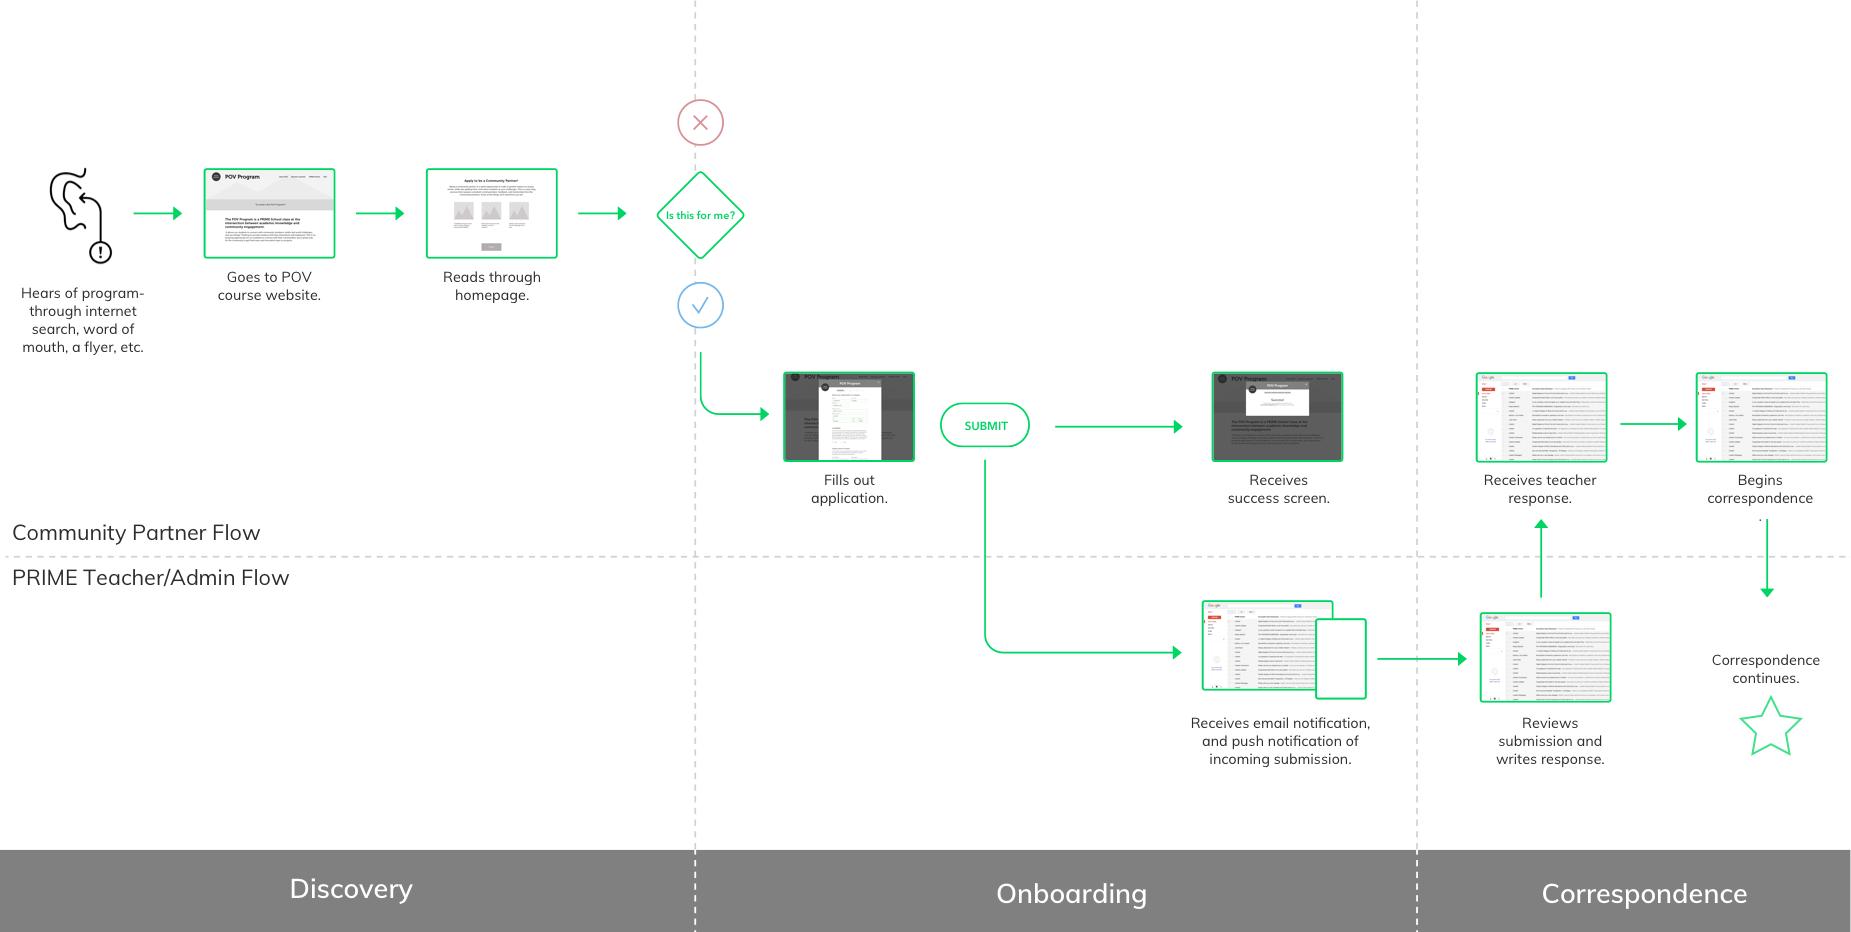 Refined wireflow diagram of onboarding process.